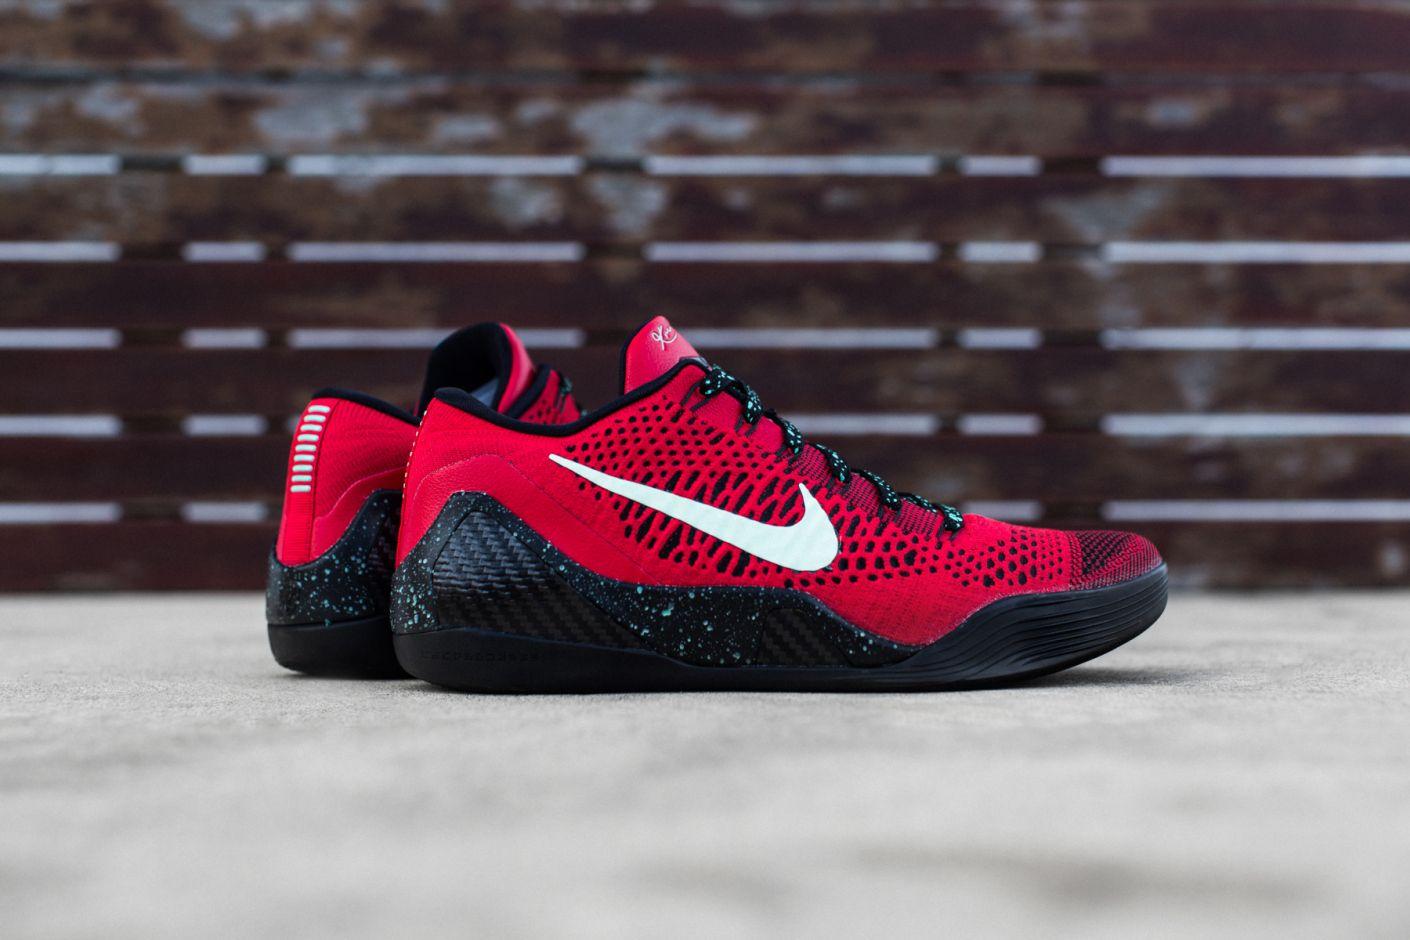 a3224462b67c Nike Kobe 9 Elite Low University Red Black in 2019